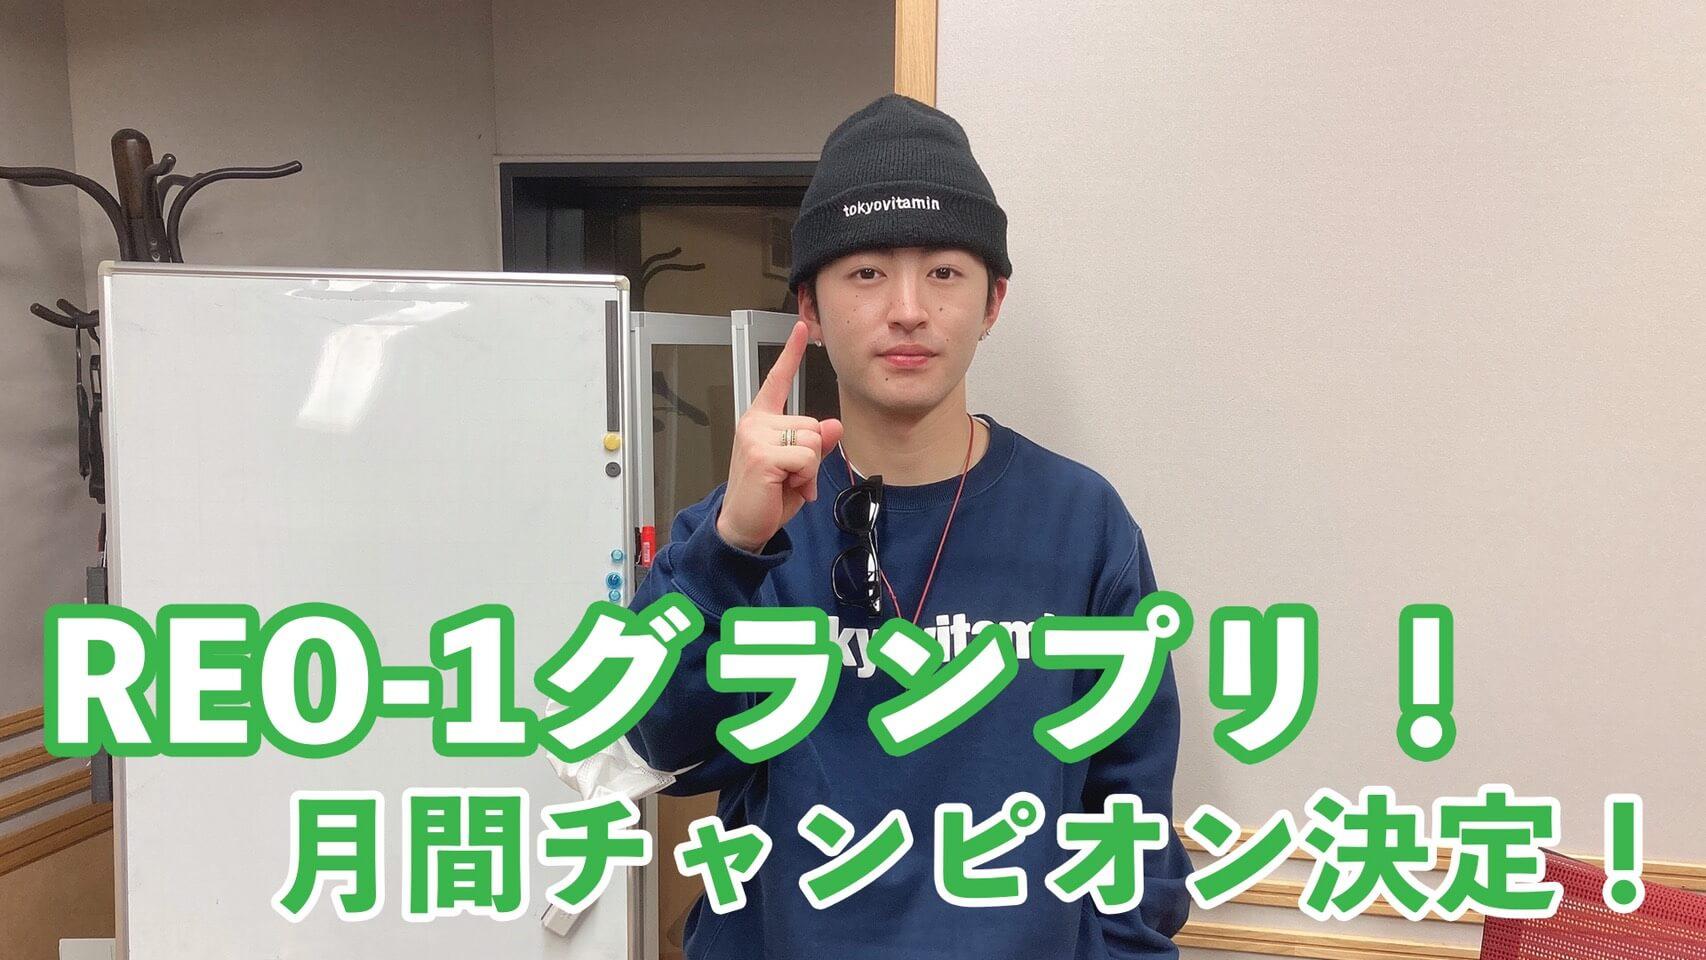 REO-1グランプリ!月間チャンピオン決定!